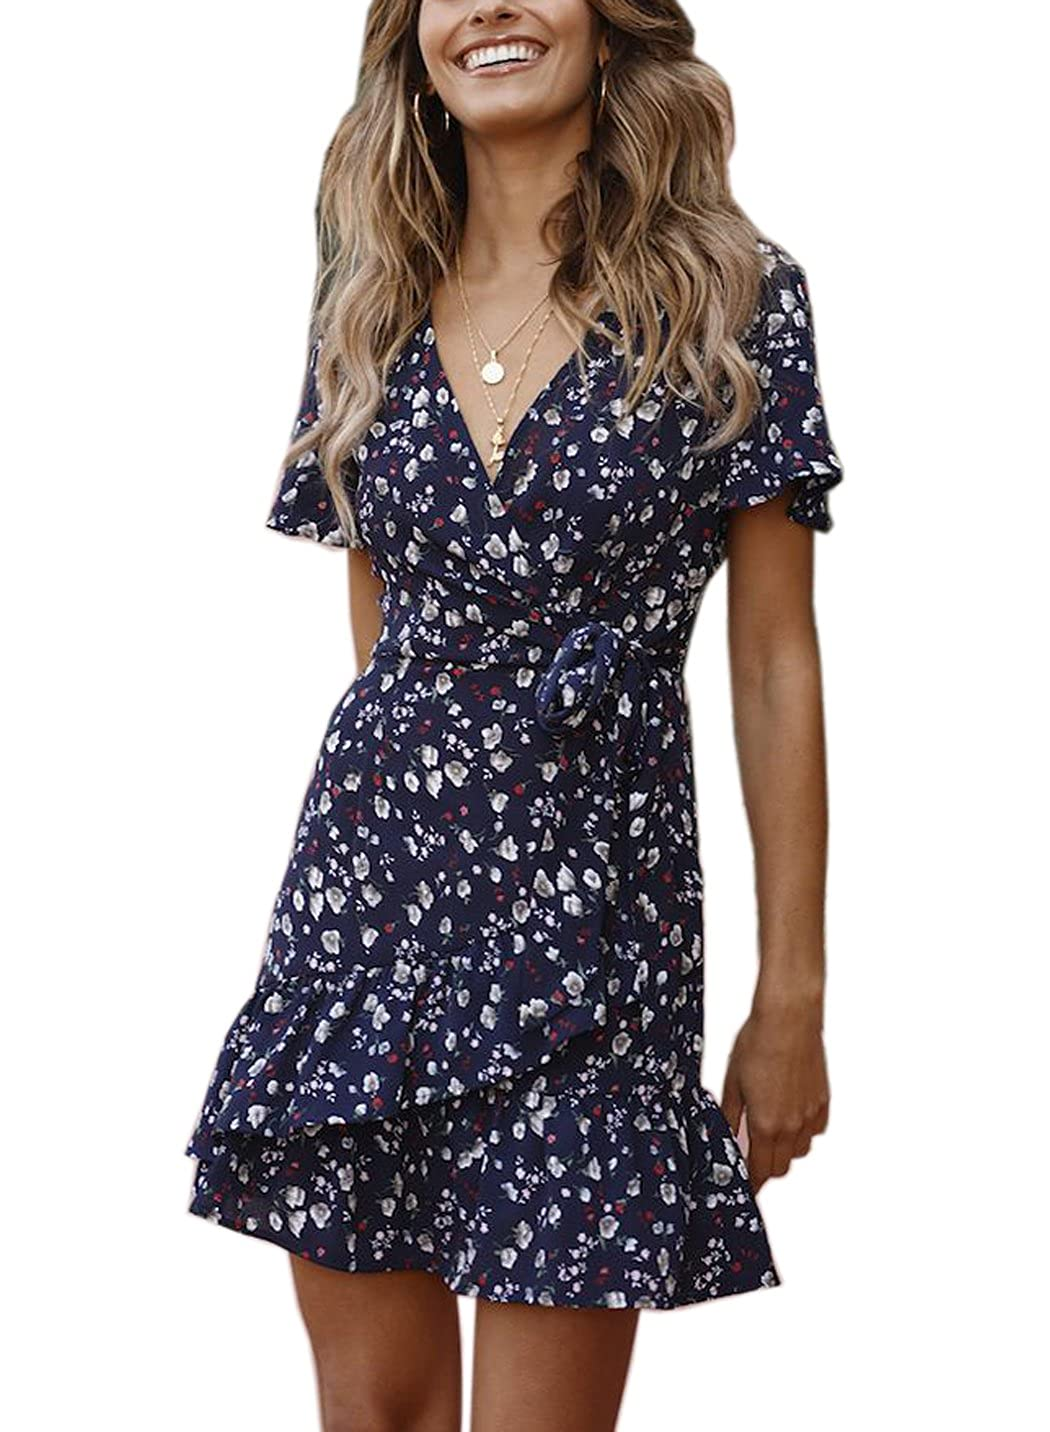 C121lanse FFLMYUHULIU Women's Vintage Deep VNeck Short Sleeves Floral Print Ruffles Hem Party Short Mini Dress